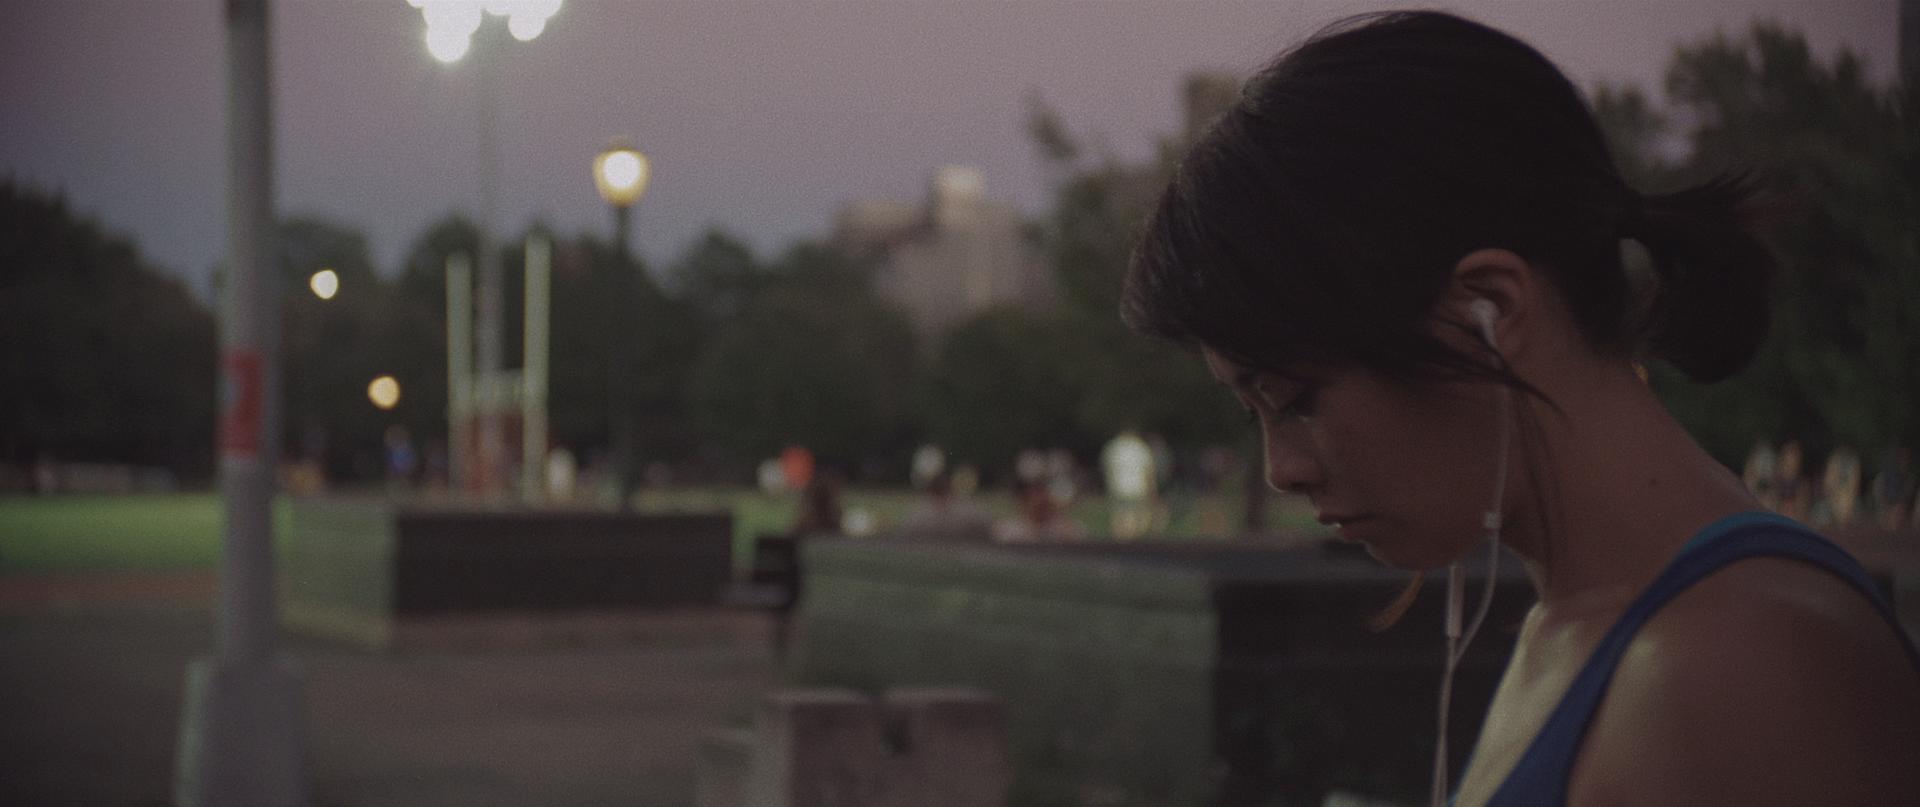 Tiffany Villarin in Shadow; Cinematographer - Ramsey Fendall; Director - Andrew Pang